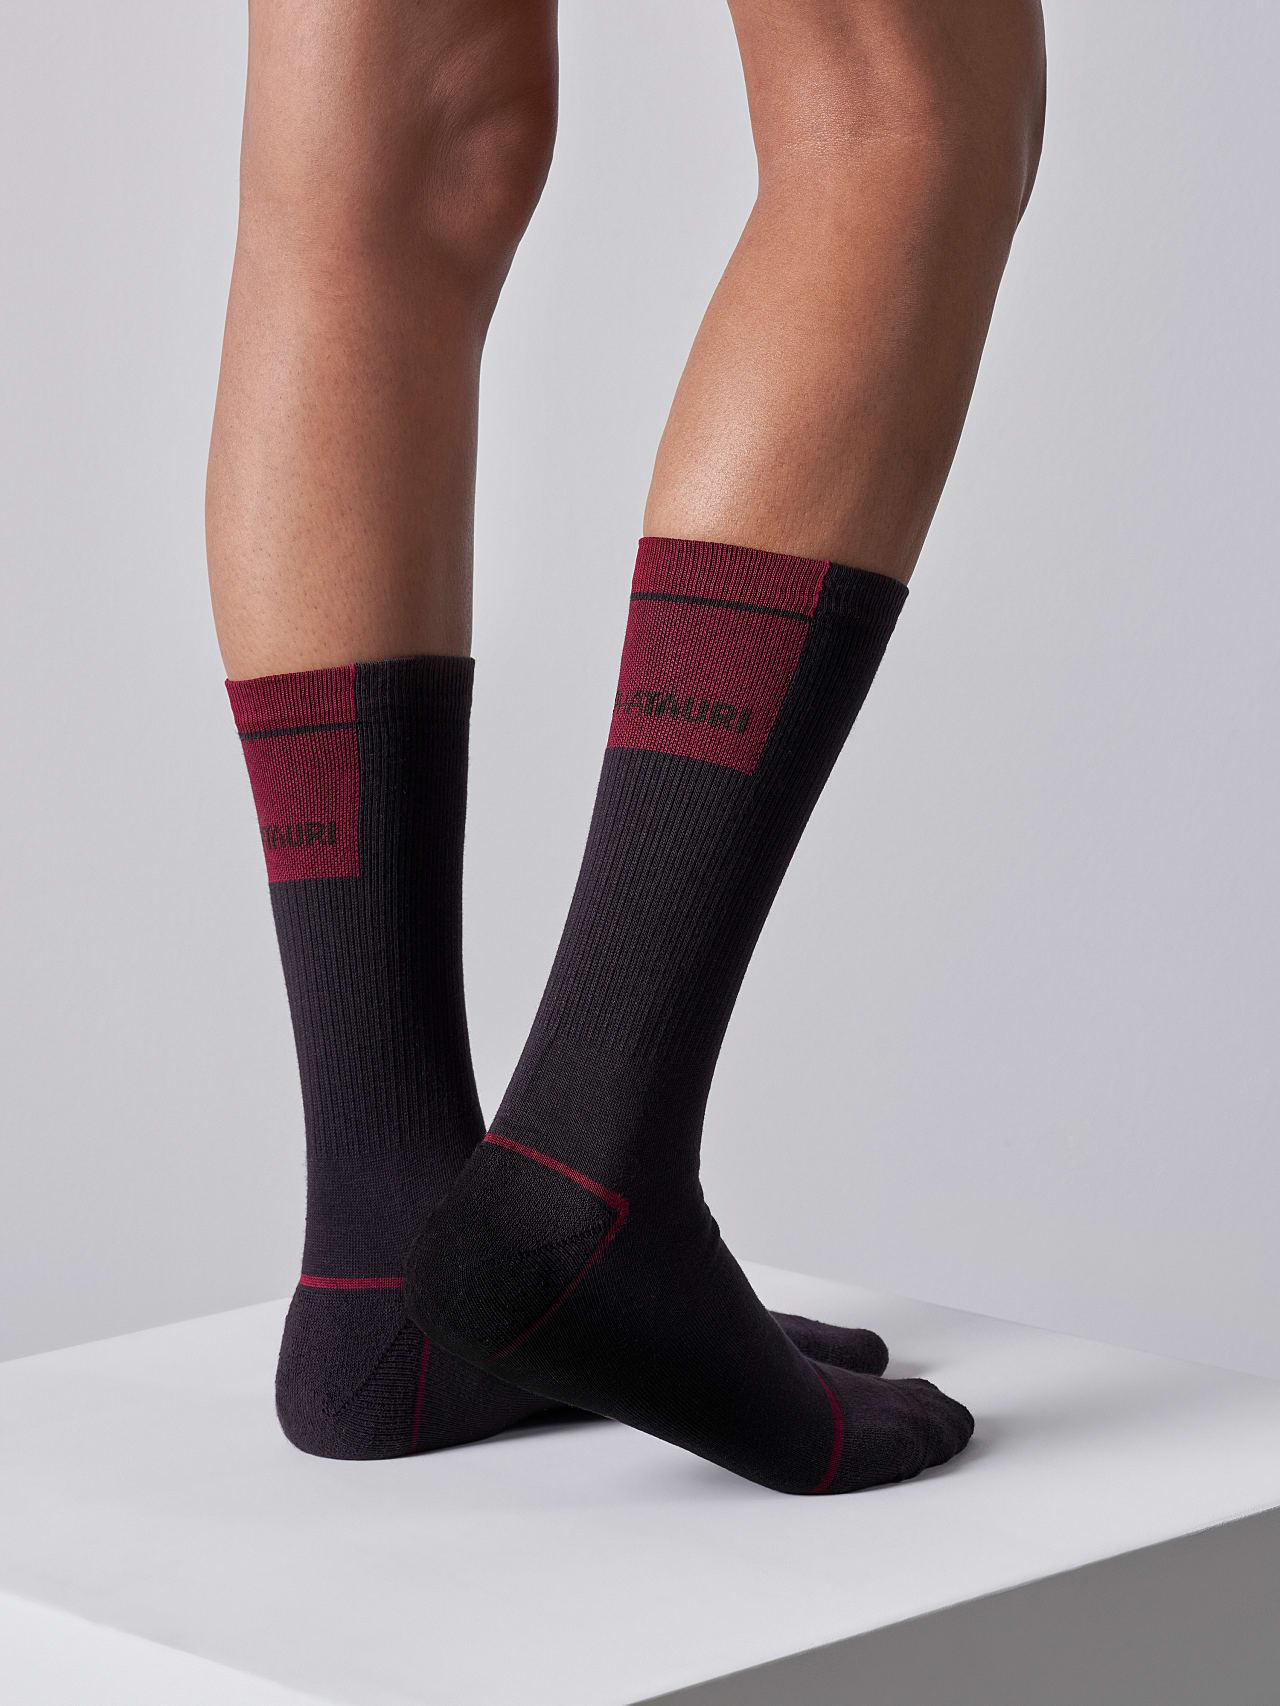 ATENI V3.Y5.02 Premium Knit Socks Burgundy Model shot Alpha Tauri